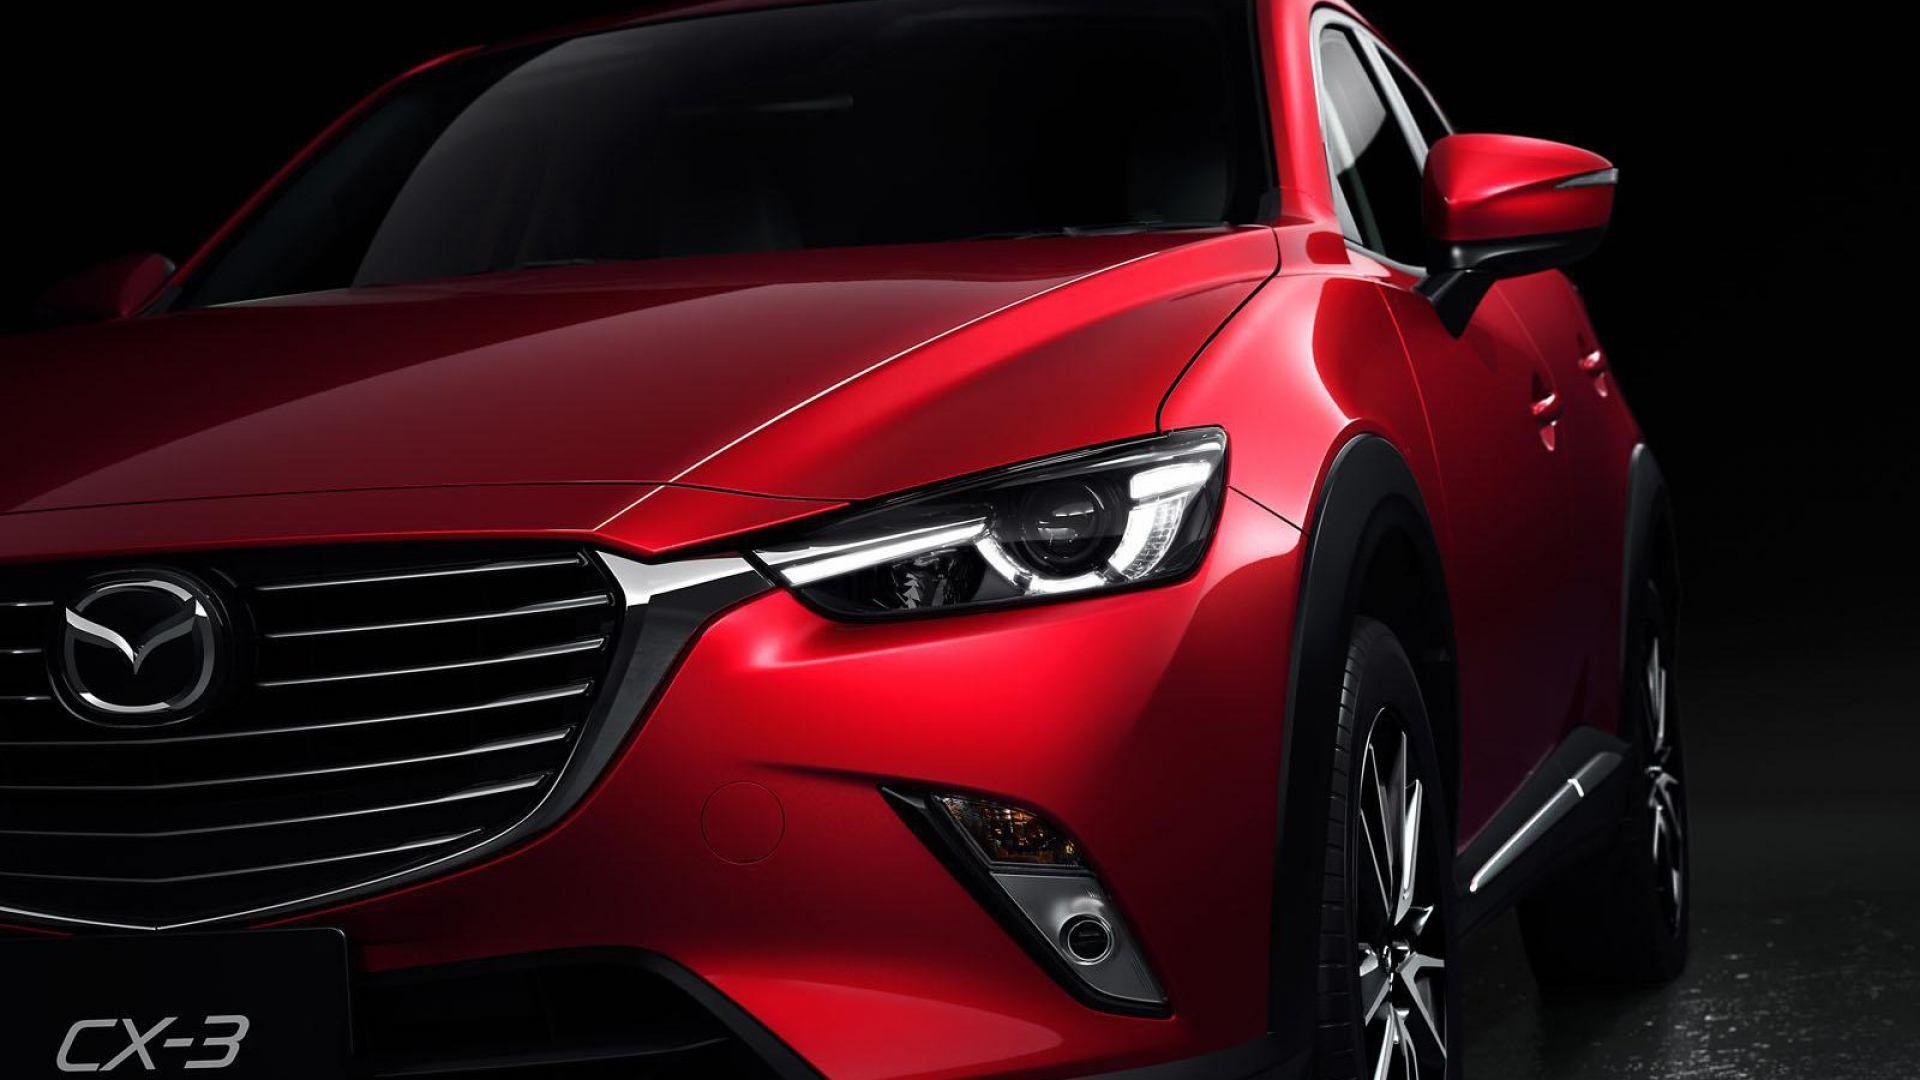 Mazda full hd 1080p wallpaper